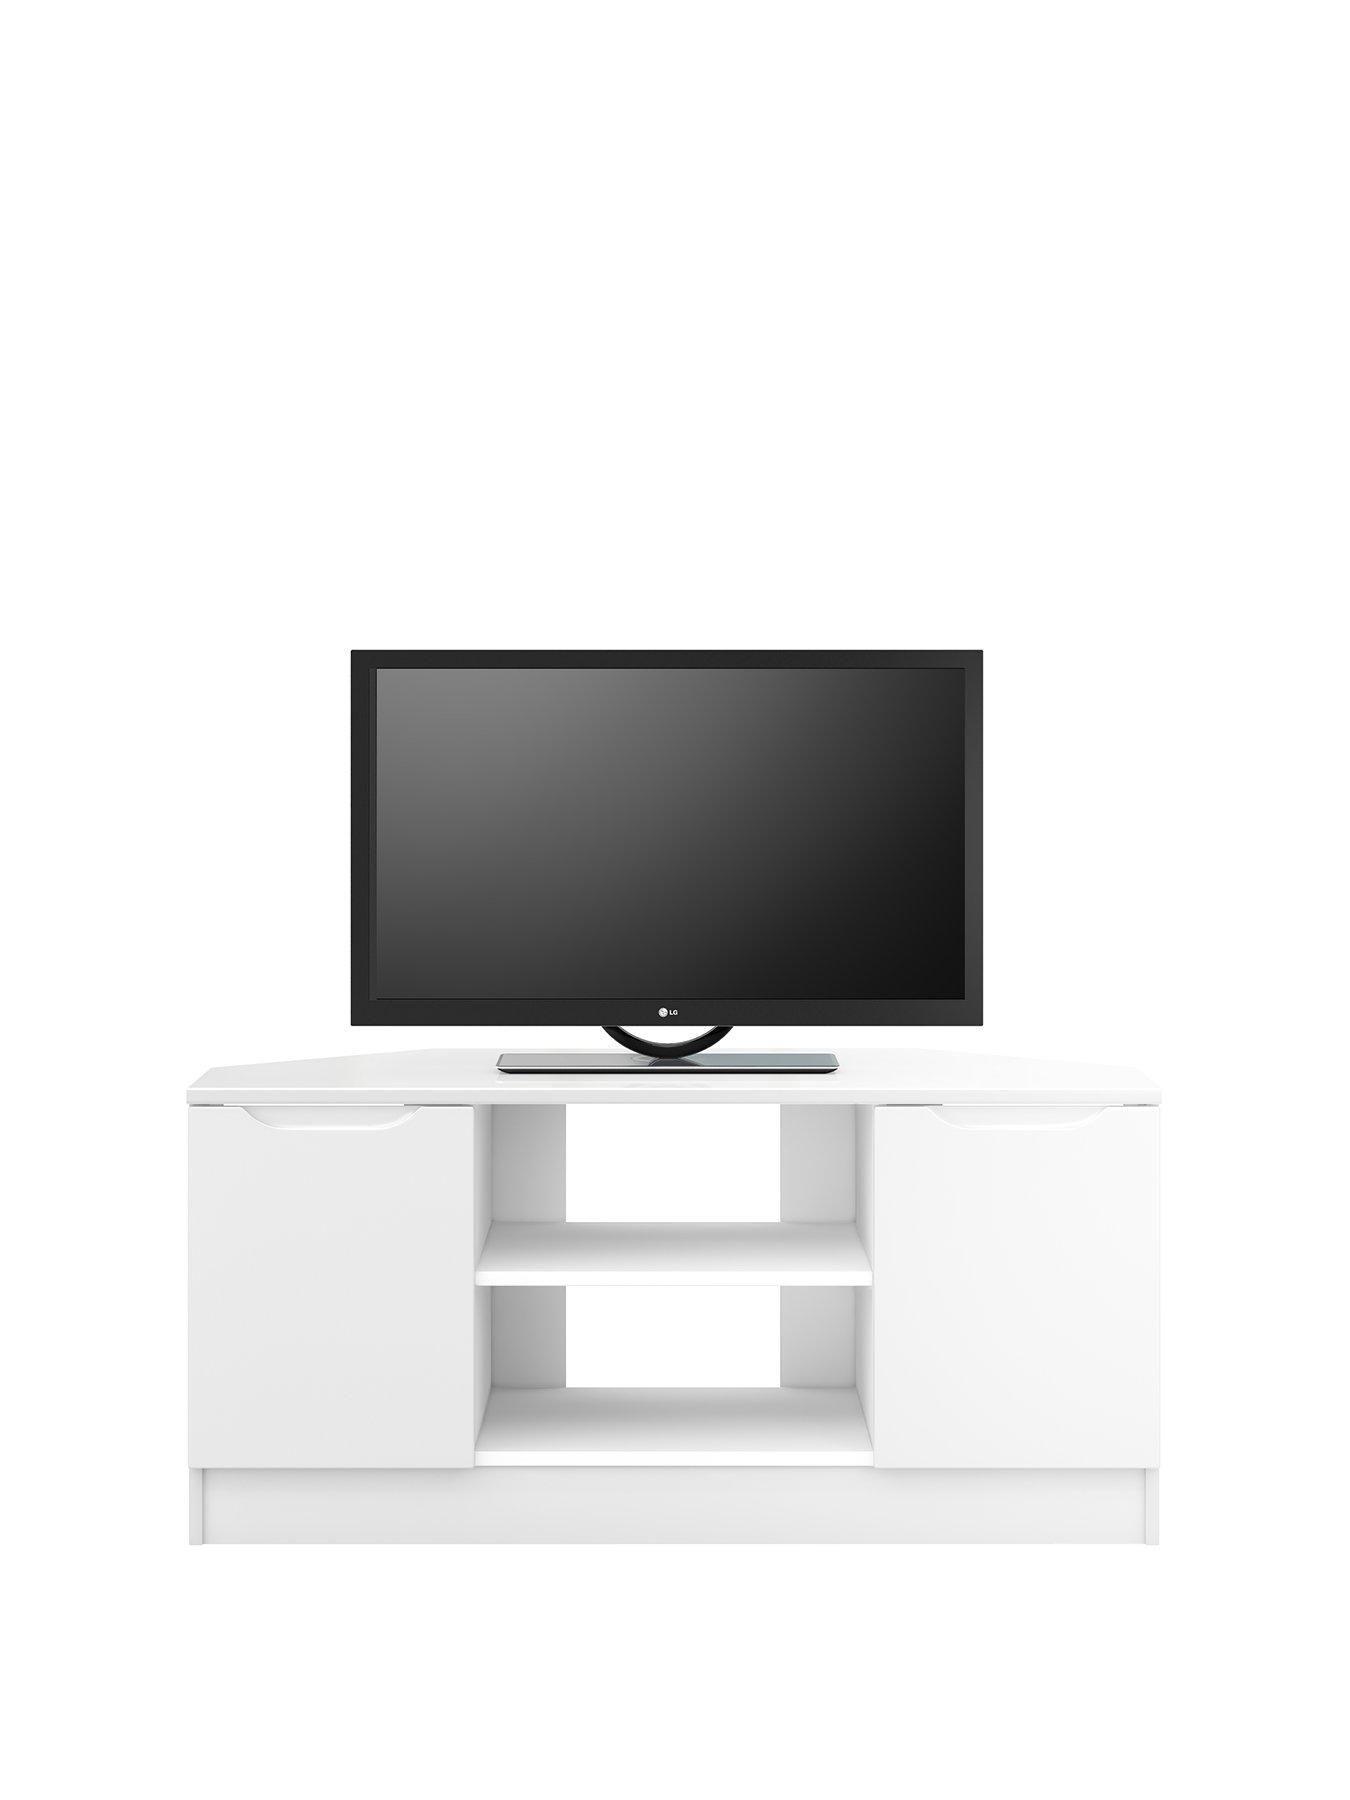 Bilbao Ready Assembled 2 Door High Gloss Corner Tv Unit White Fits Up To 46 Inch Tv Corner Tv Unit Tv Unit Corner Tv